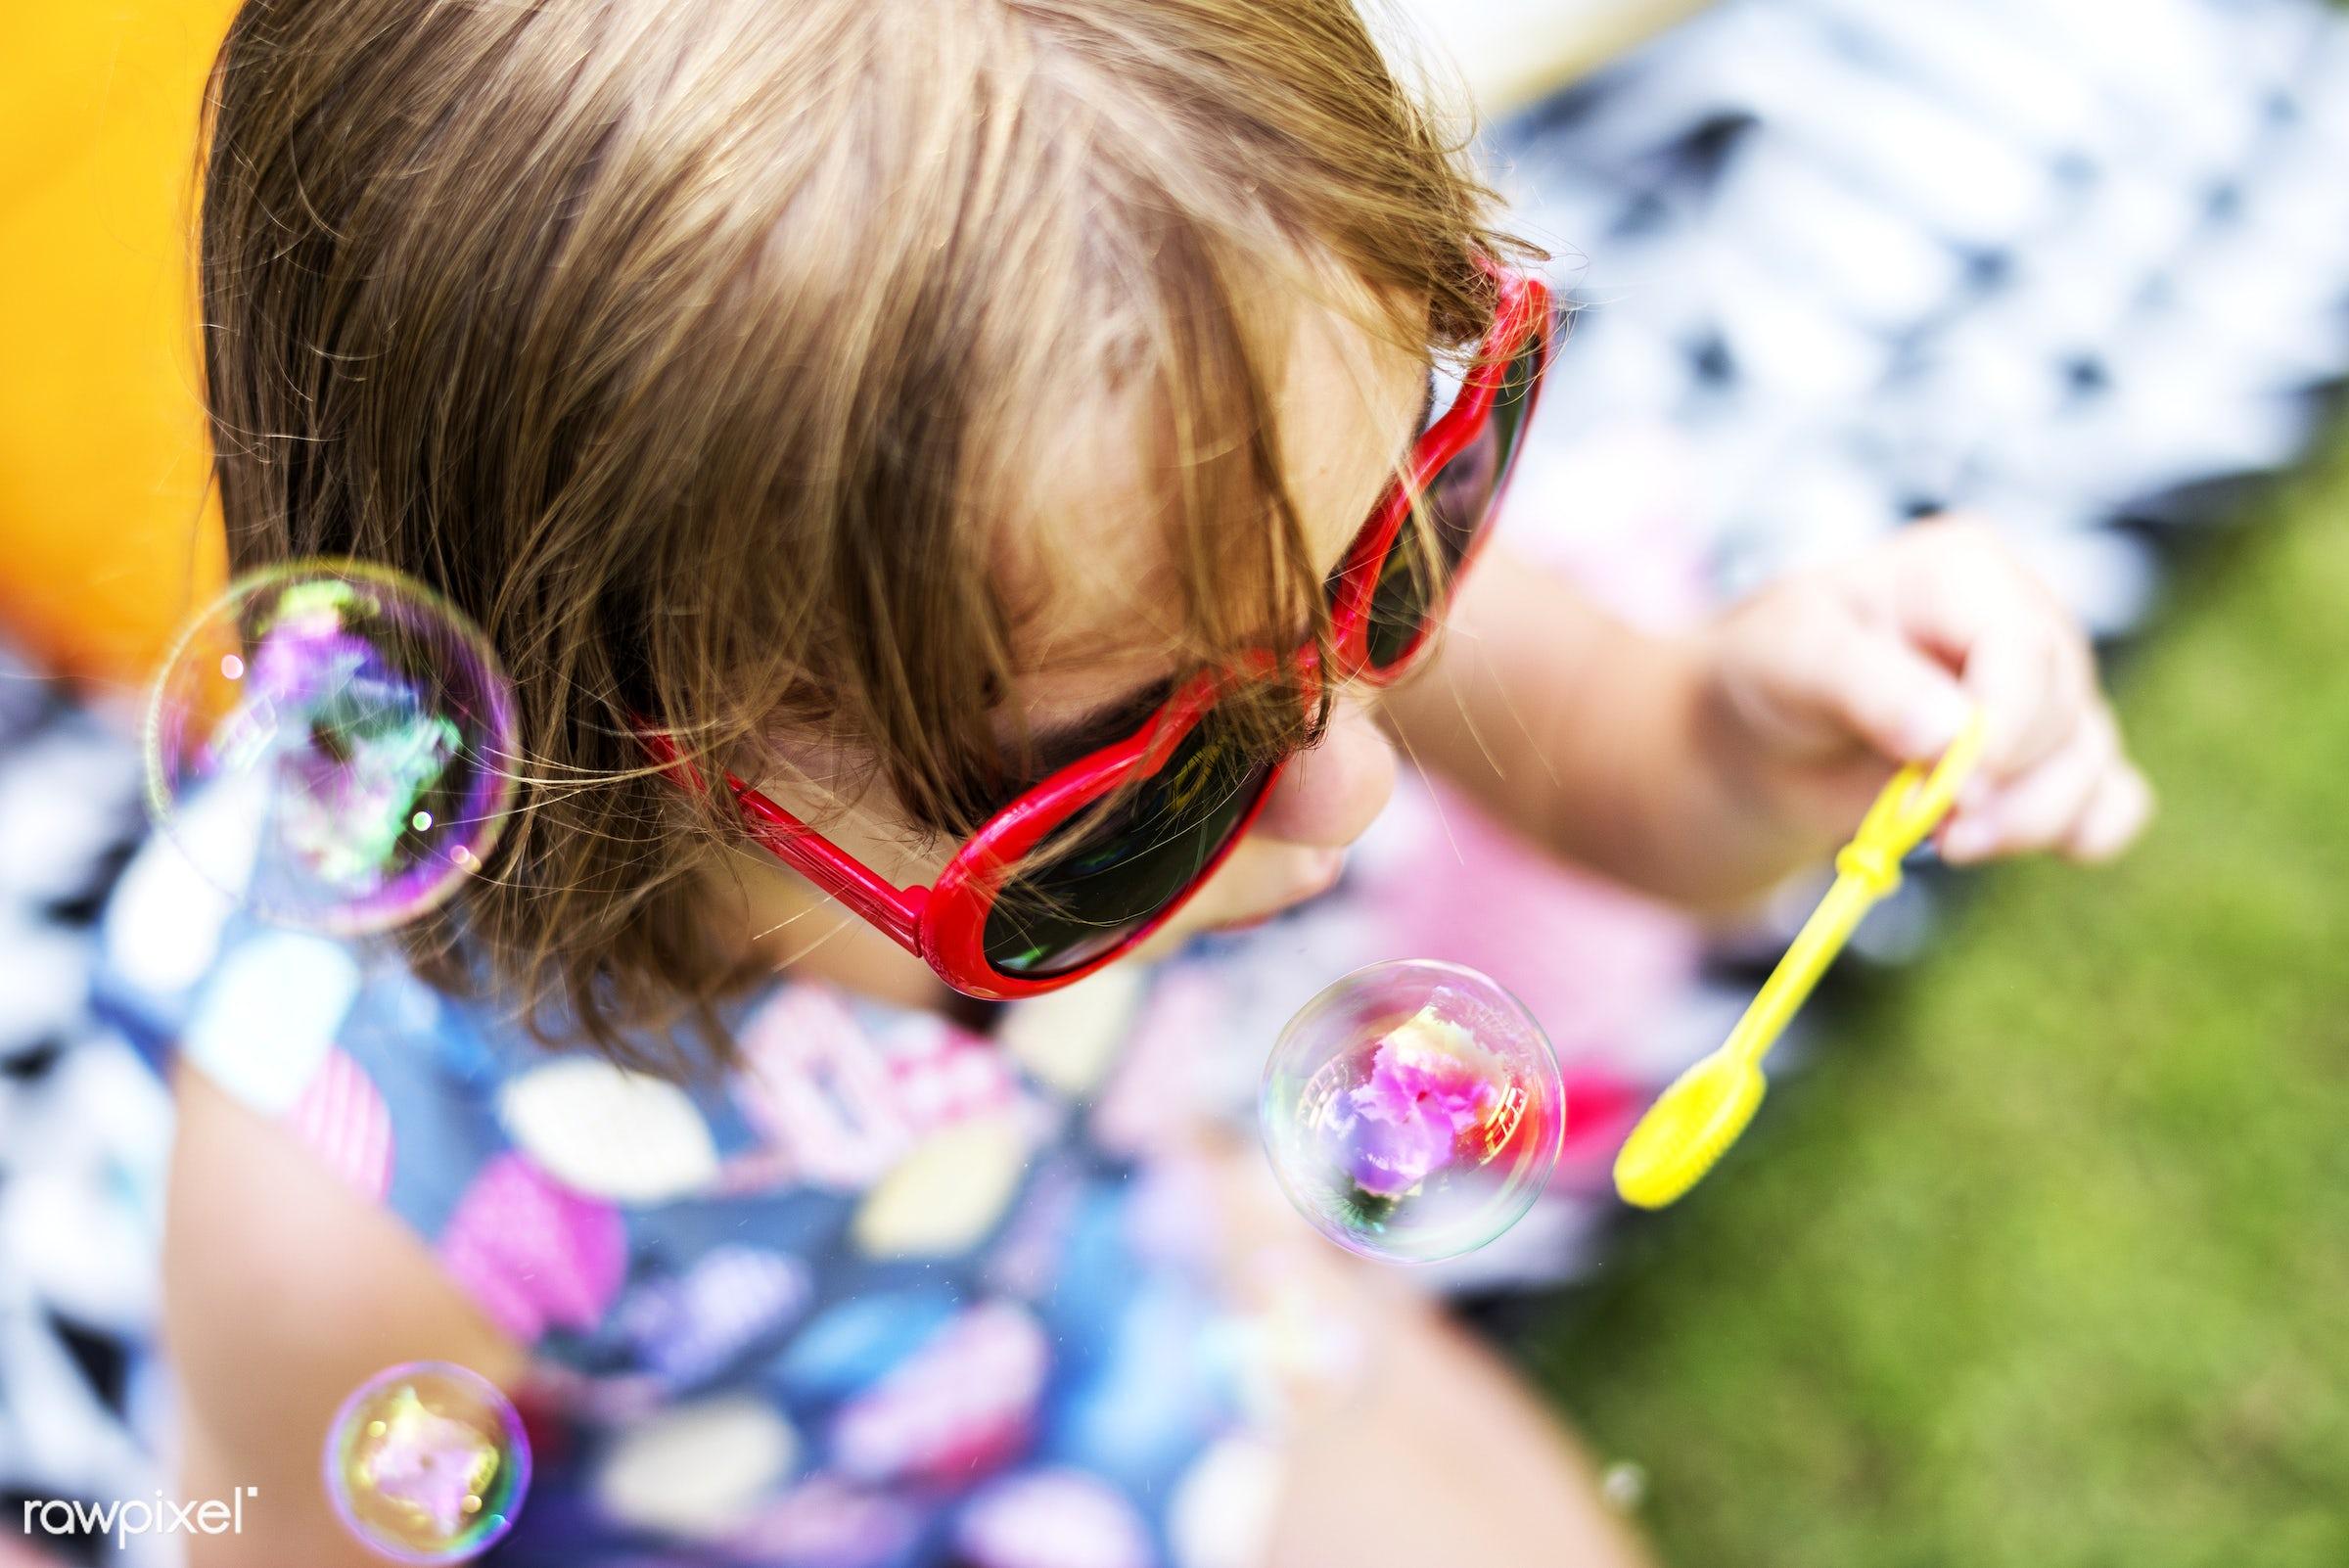 alone, backyard, blowing, bubble, cheerful, child, closeup, enjoying, fun, girl, happiness, kid, leisure, outdoors, playing...